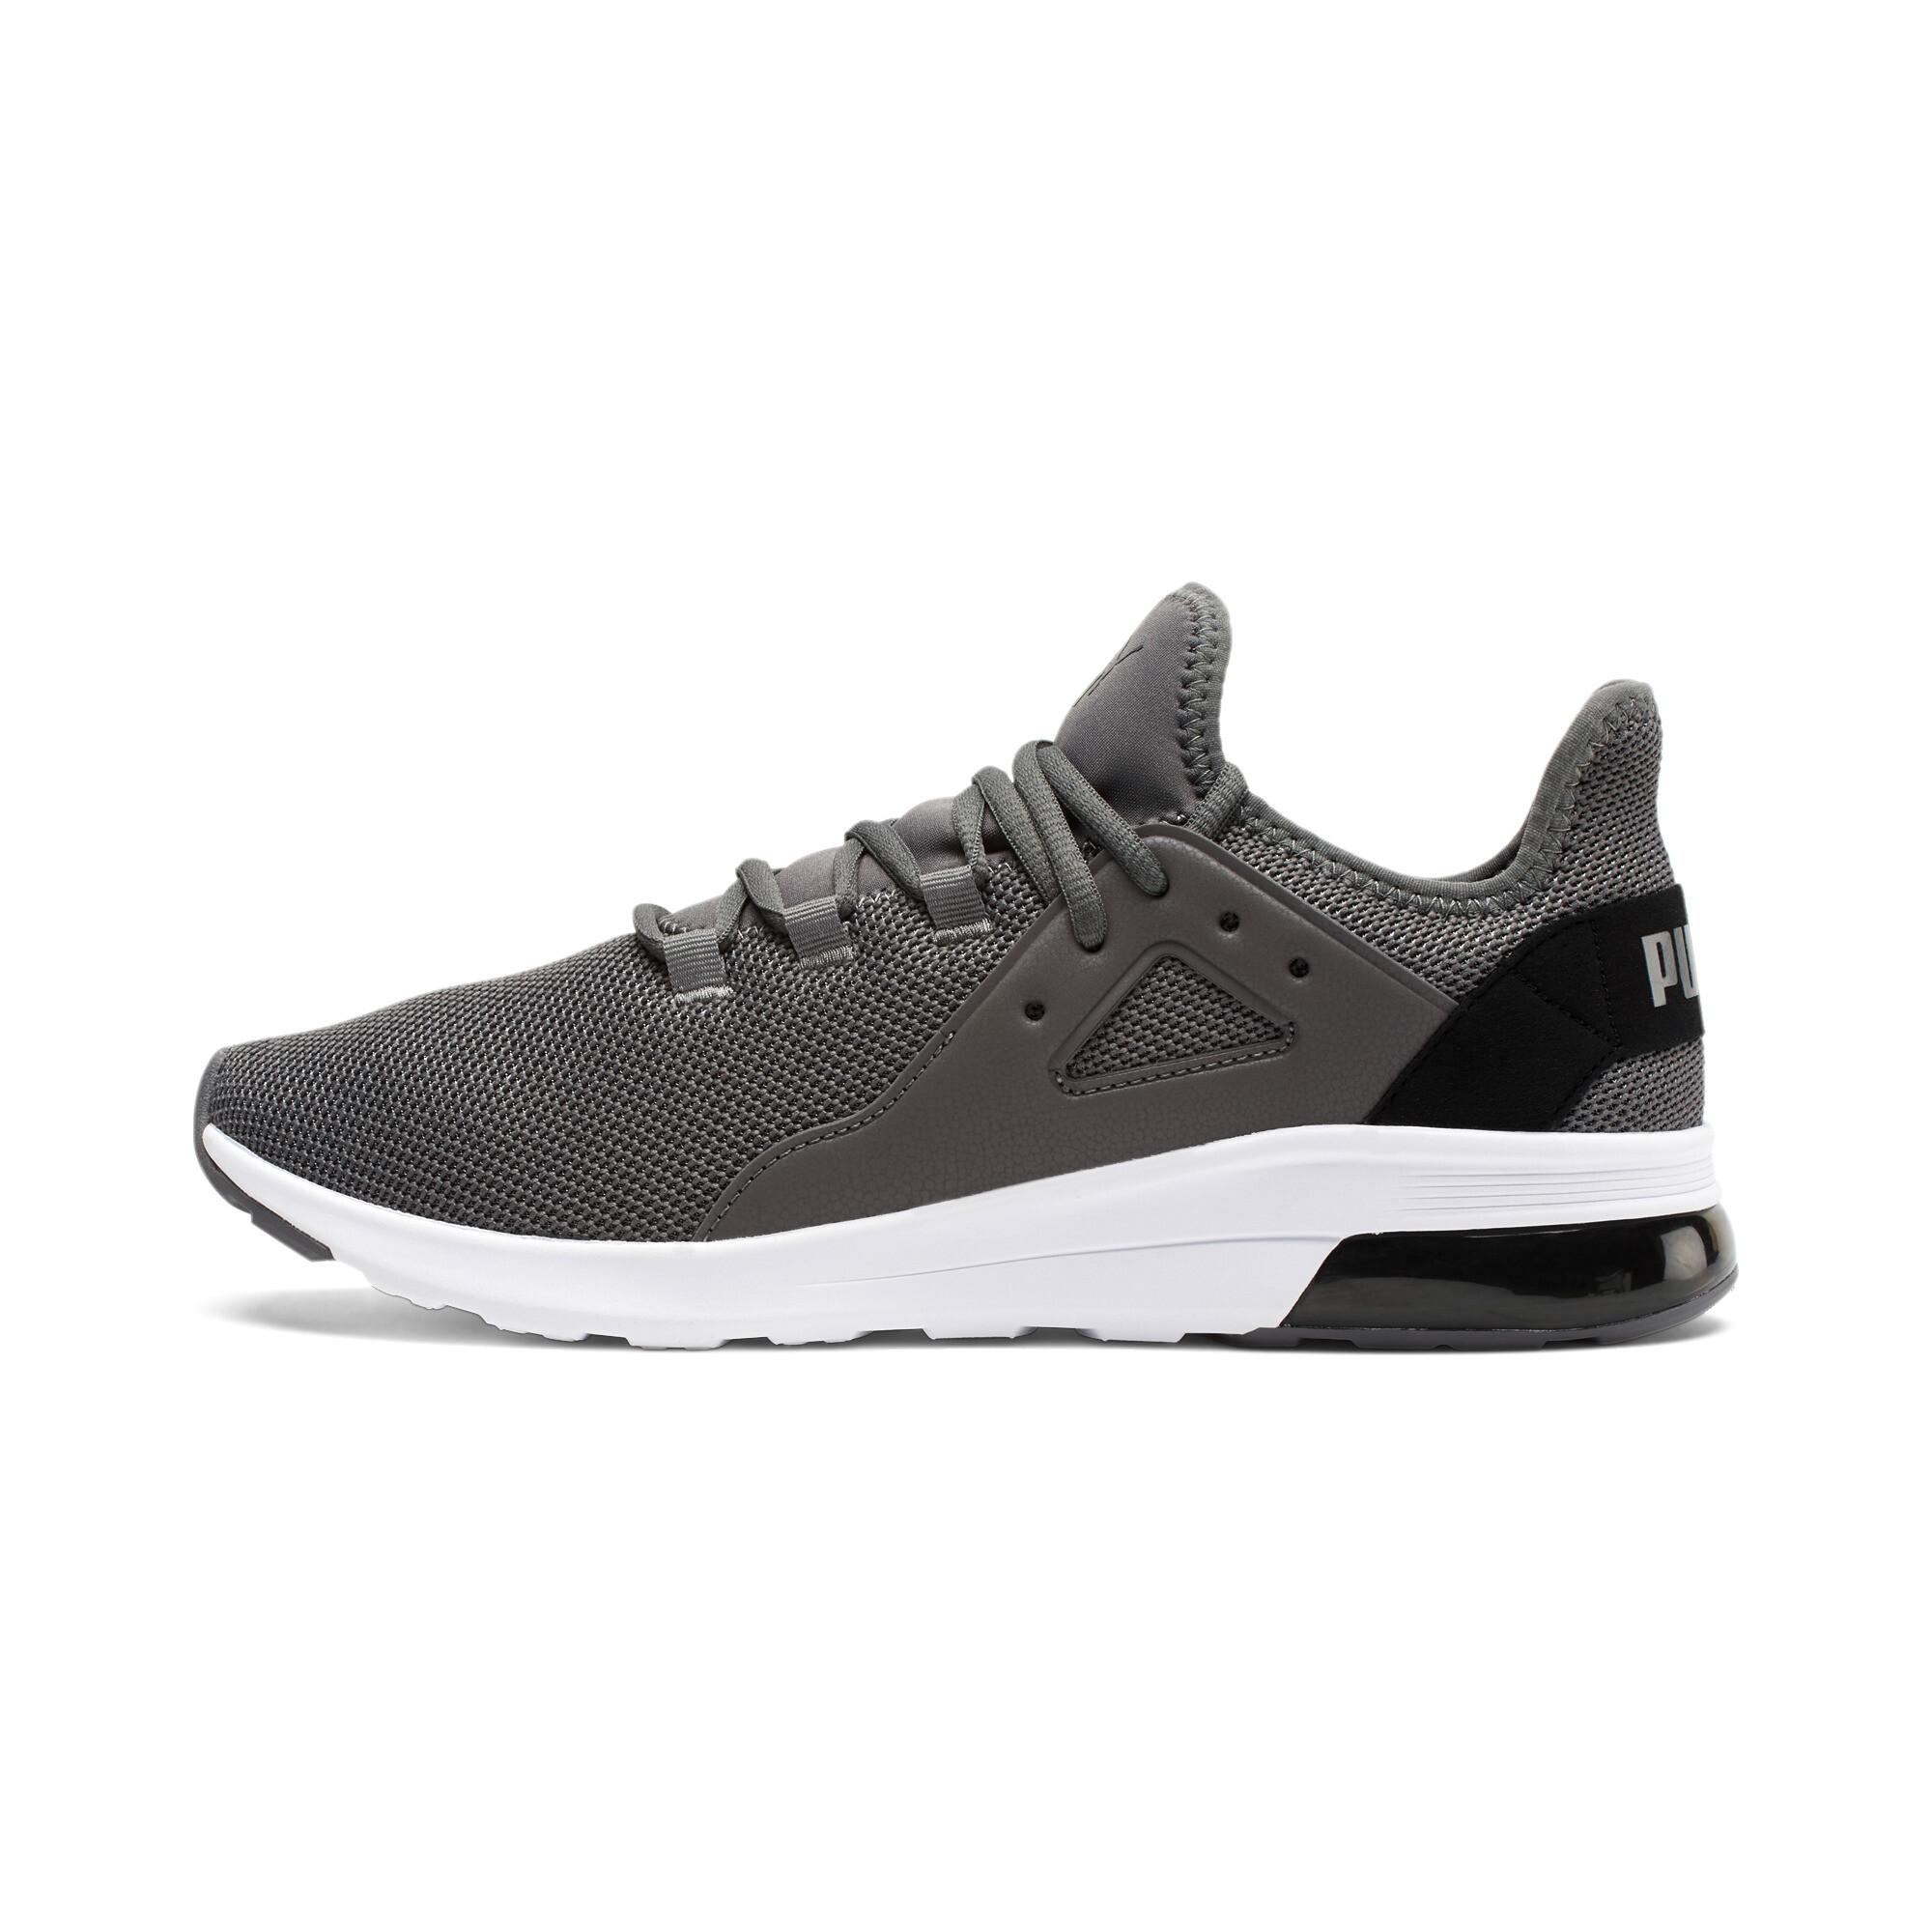 PUMA-Men-039-s-Electron-Street-Sneakers thumbnail 23